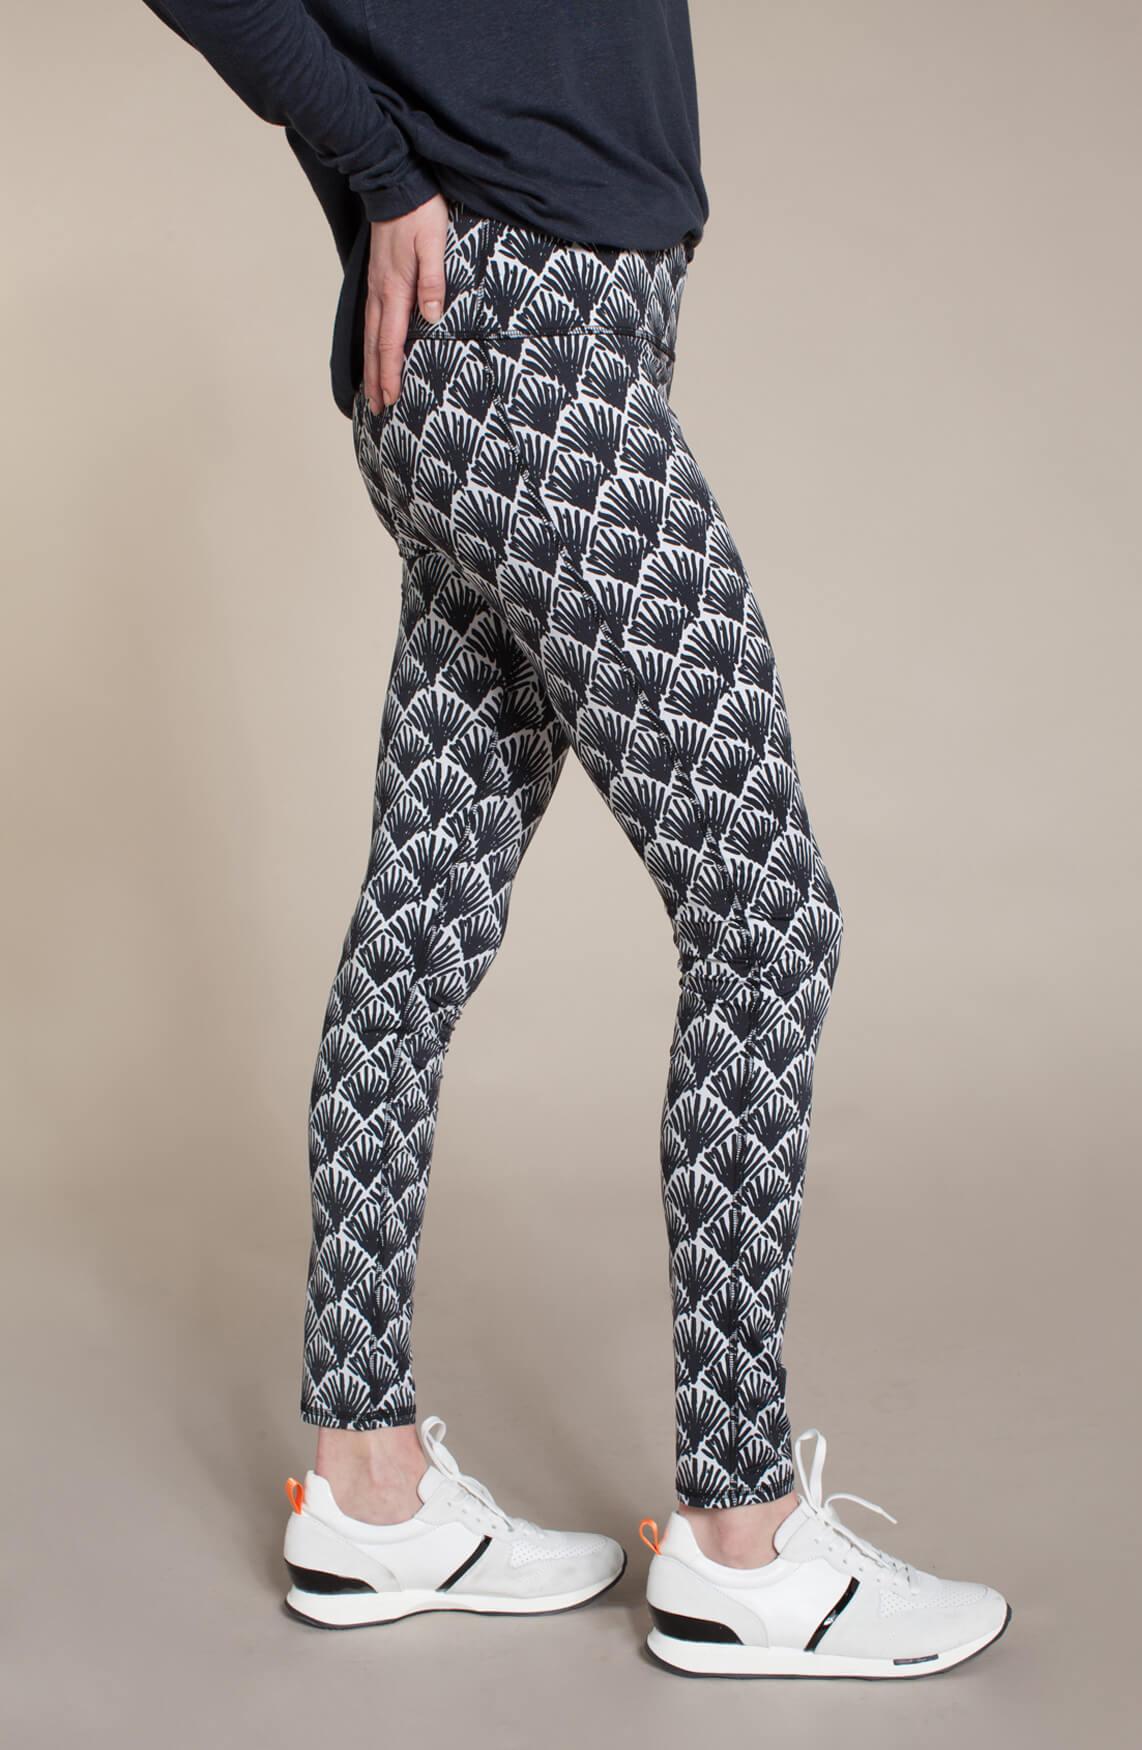 10 Days Dames Geprinte legging zwart